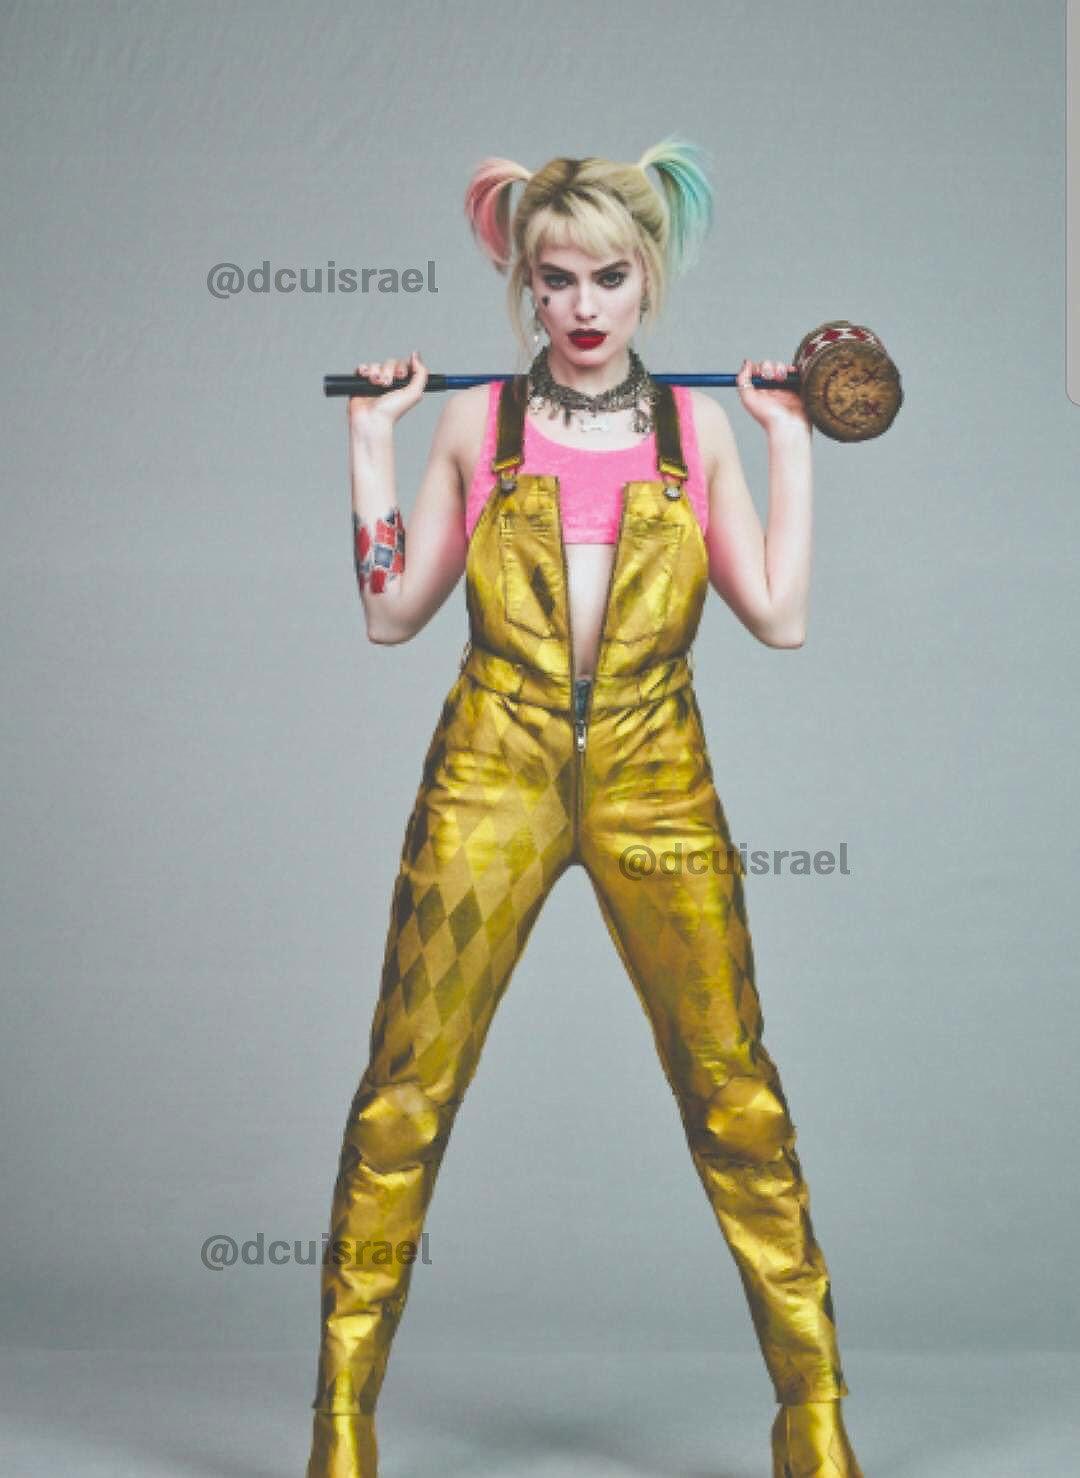 Margot Robbie As Harley Quinn In Birds Of Prey Dceu Dc Extended Universe Fotografia 42881639 Fanpop Page 4